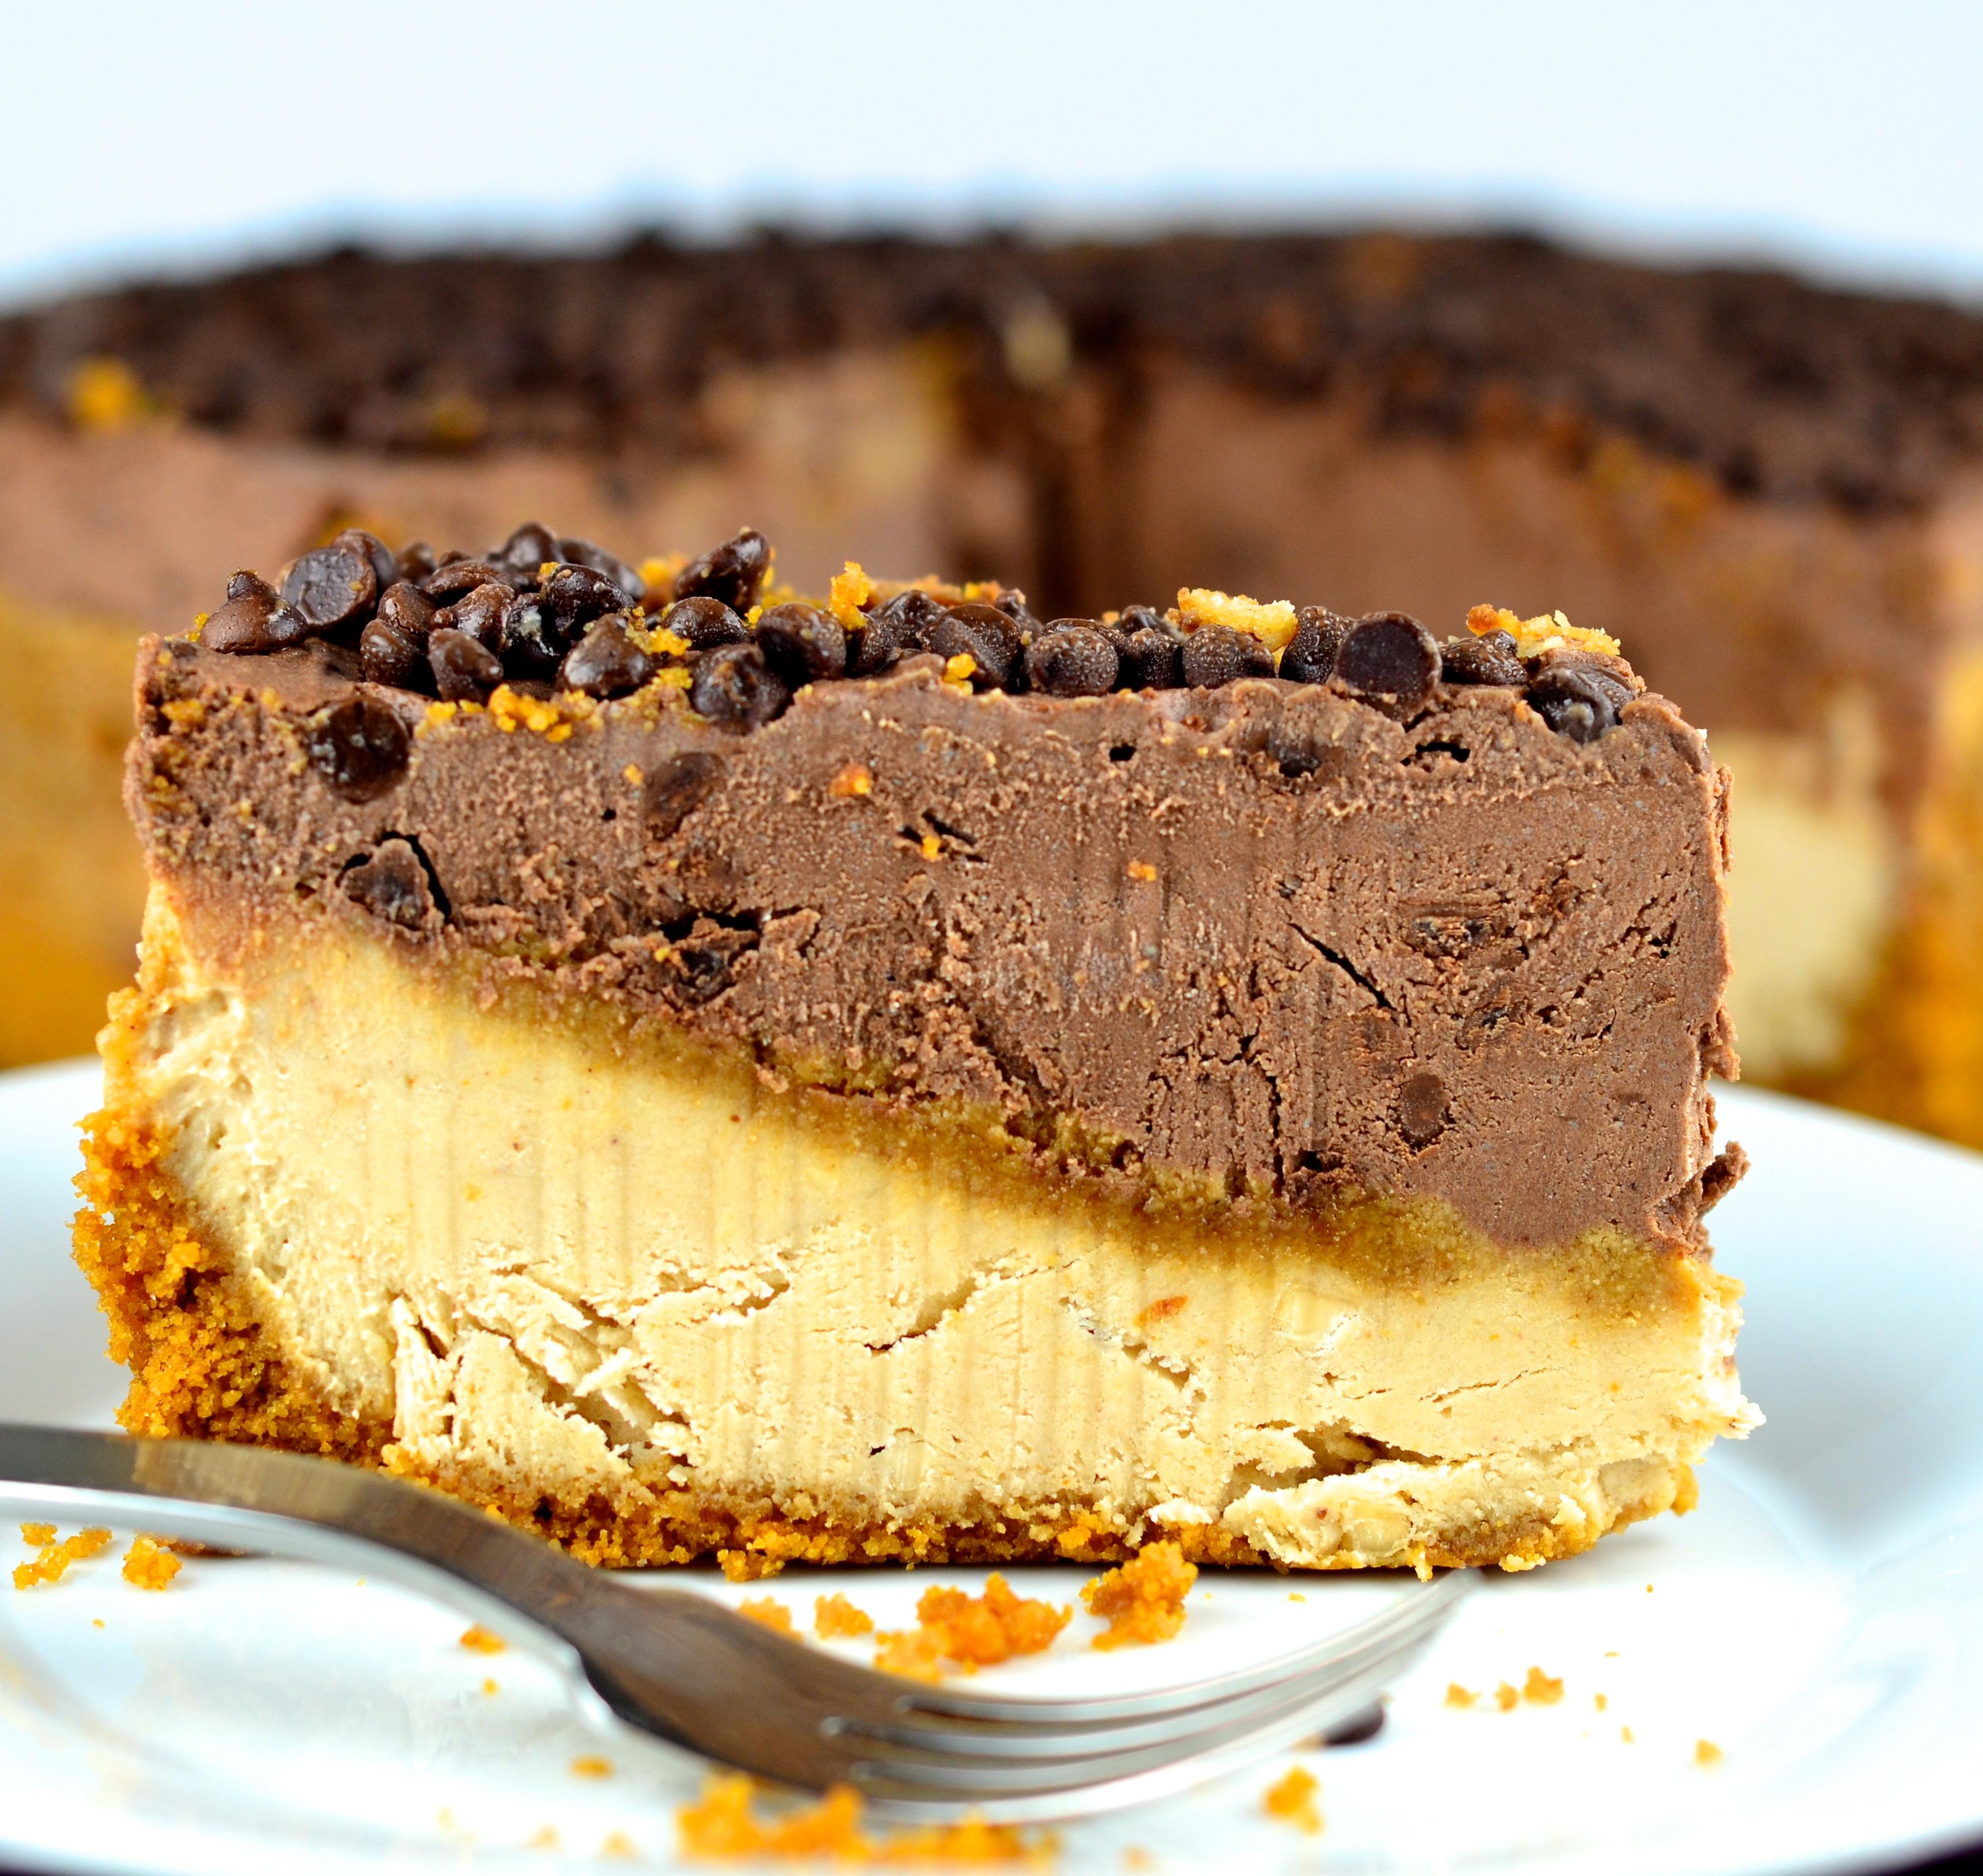 No-Bake Peanut Butter & Chocolate Vegan Cheesecake #cheesecake #vegan #chocolate #peanutButter #Vegan #glutenFree #dessert